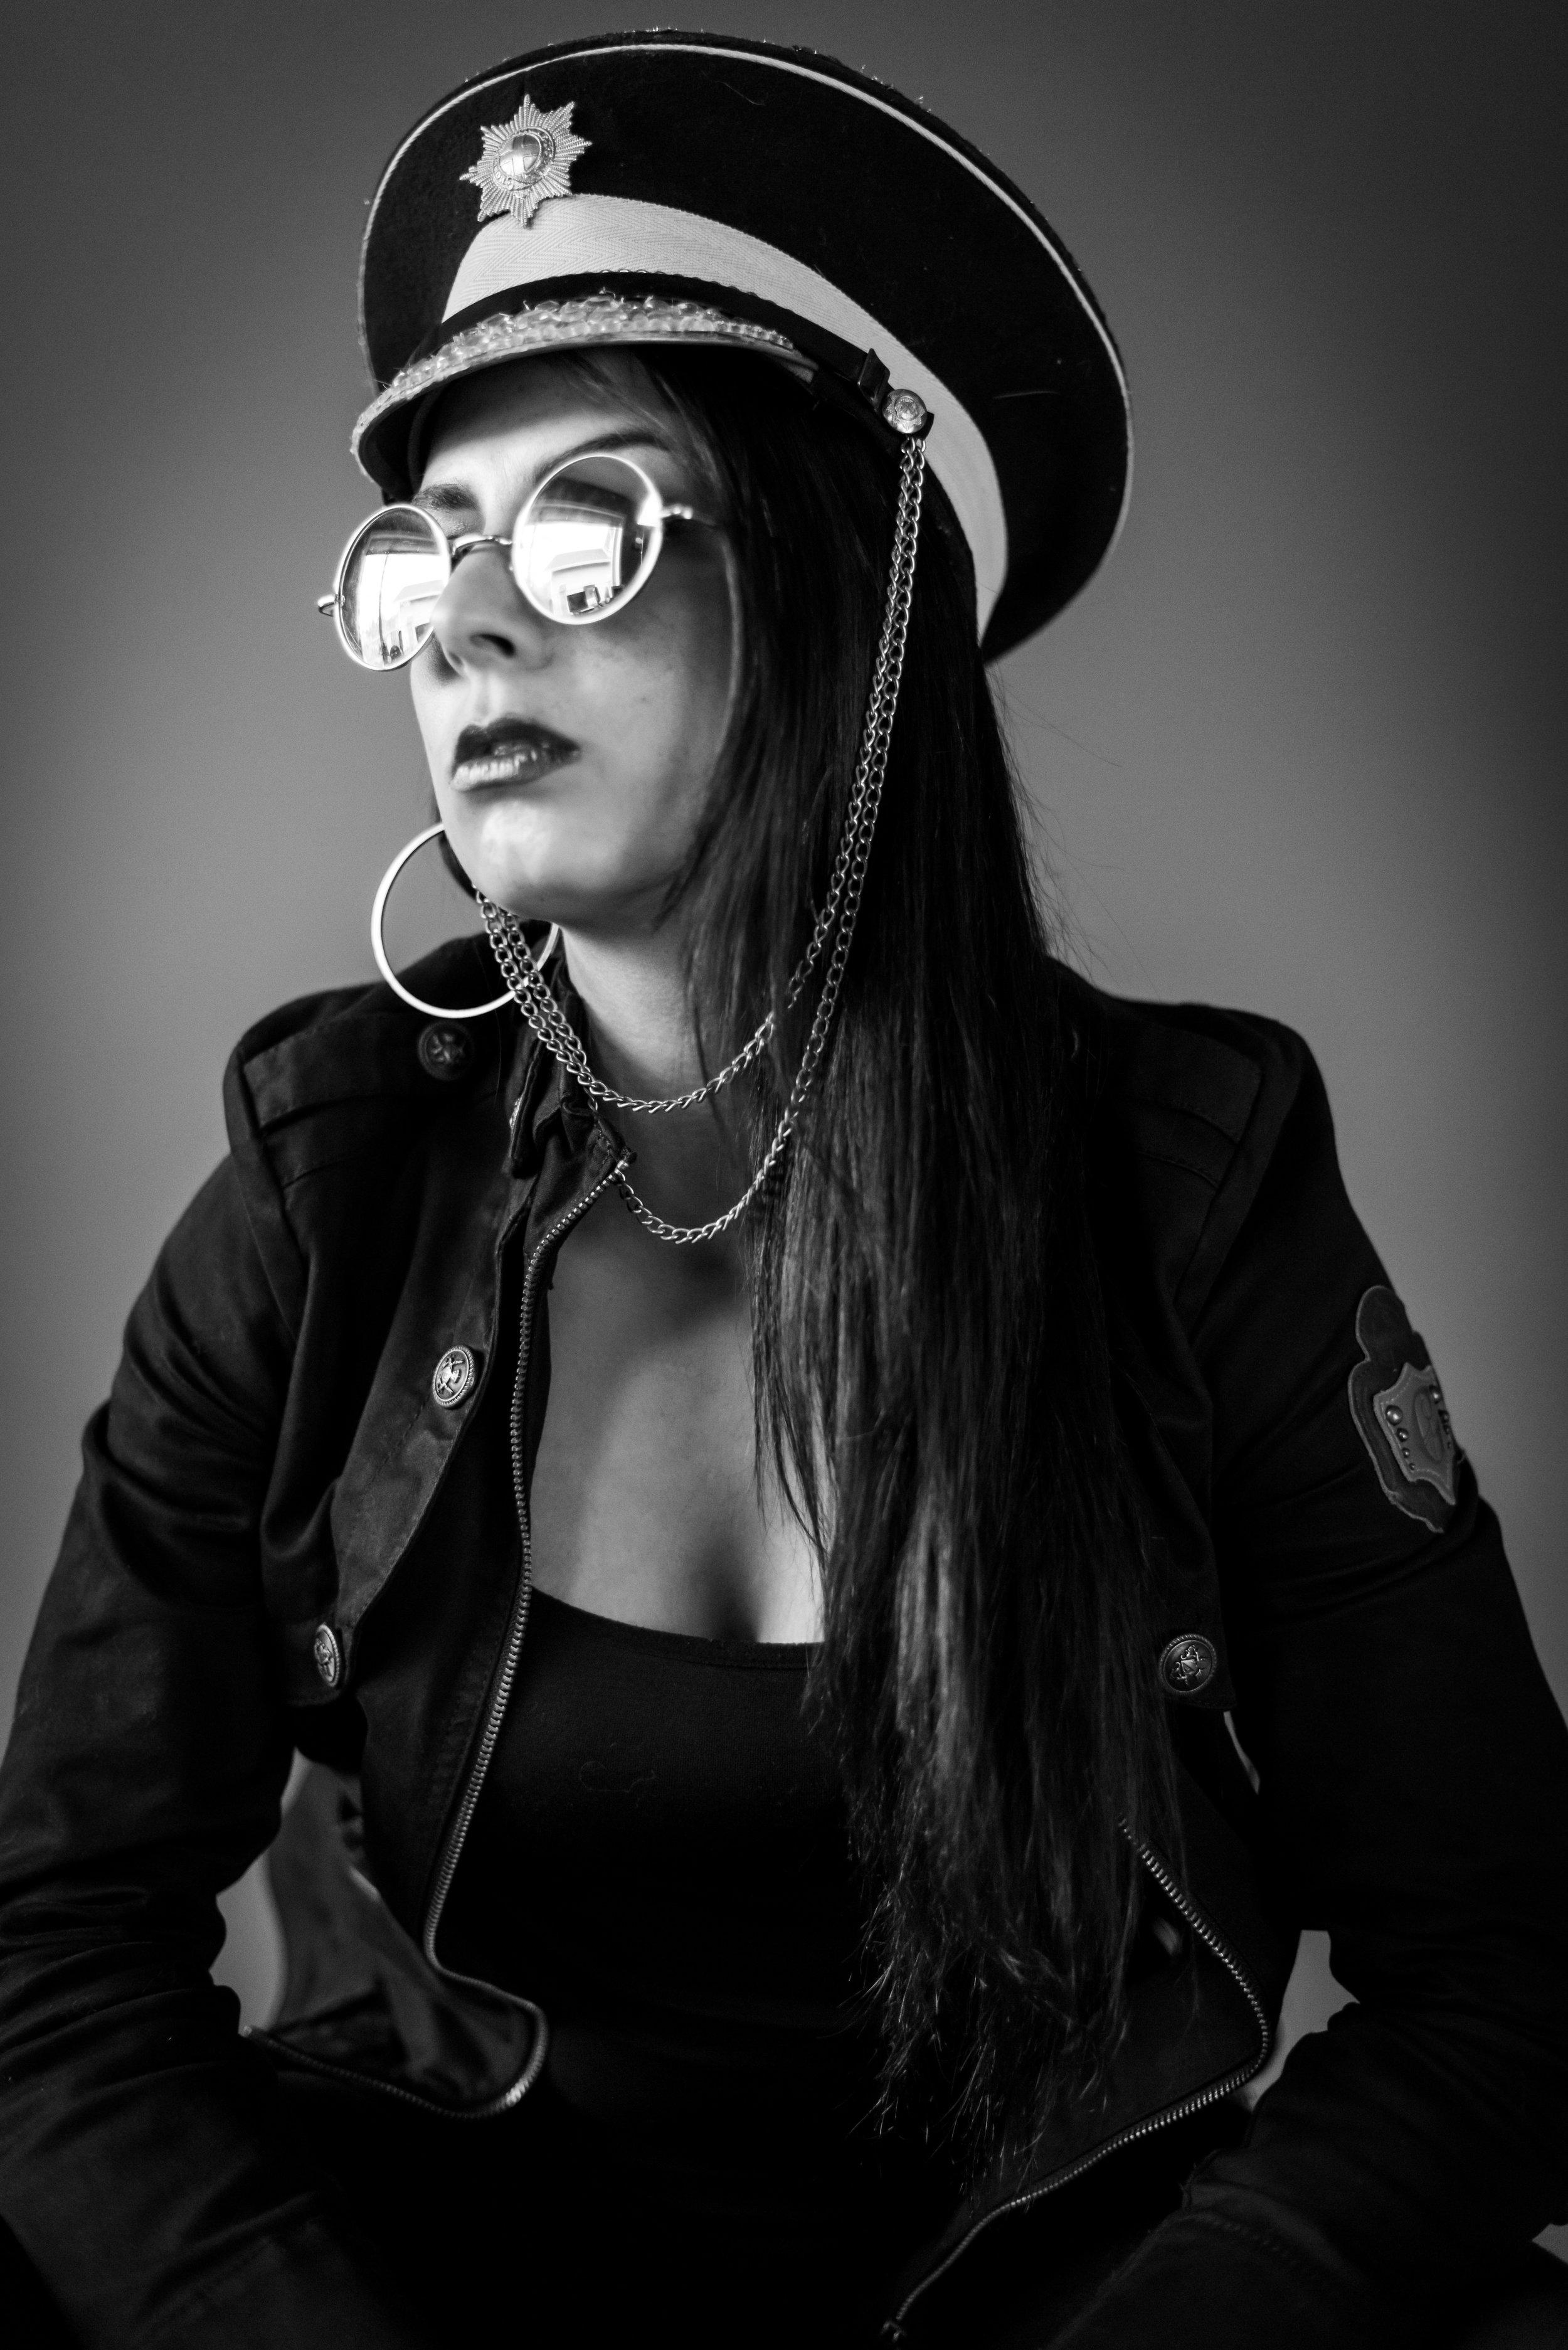 Photo by Nic Halston